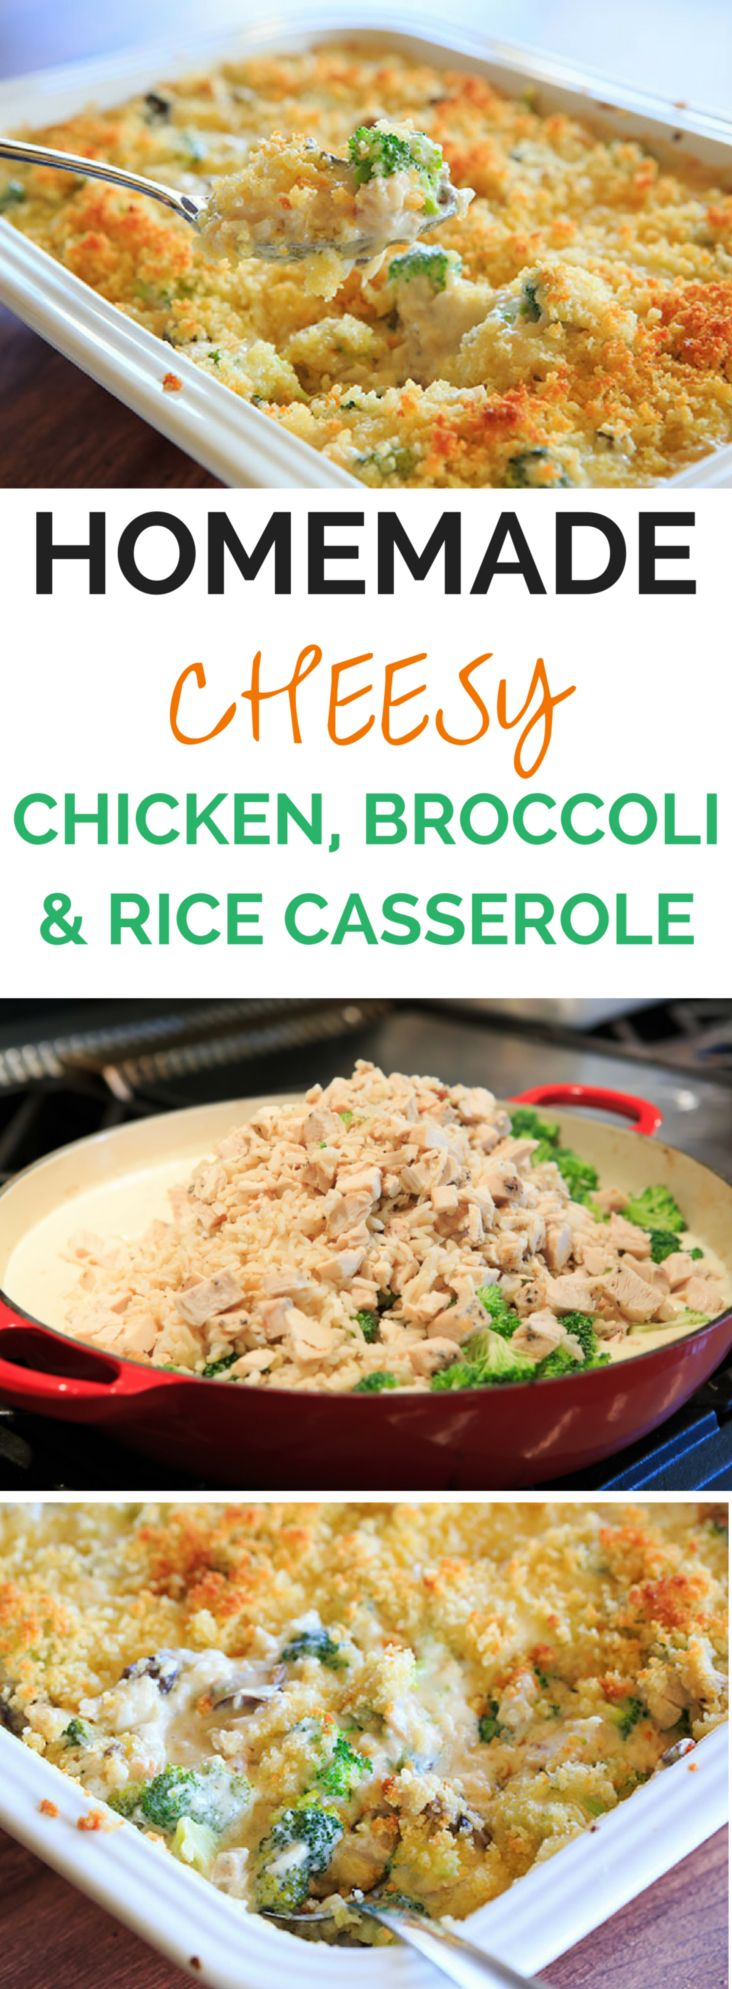 Cheesy Chicken, Broccoli  Rice Casserole From Scratch -5468